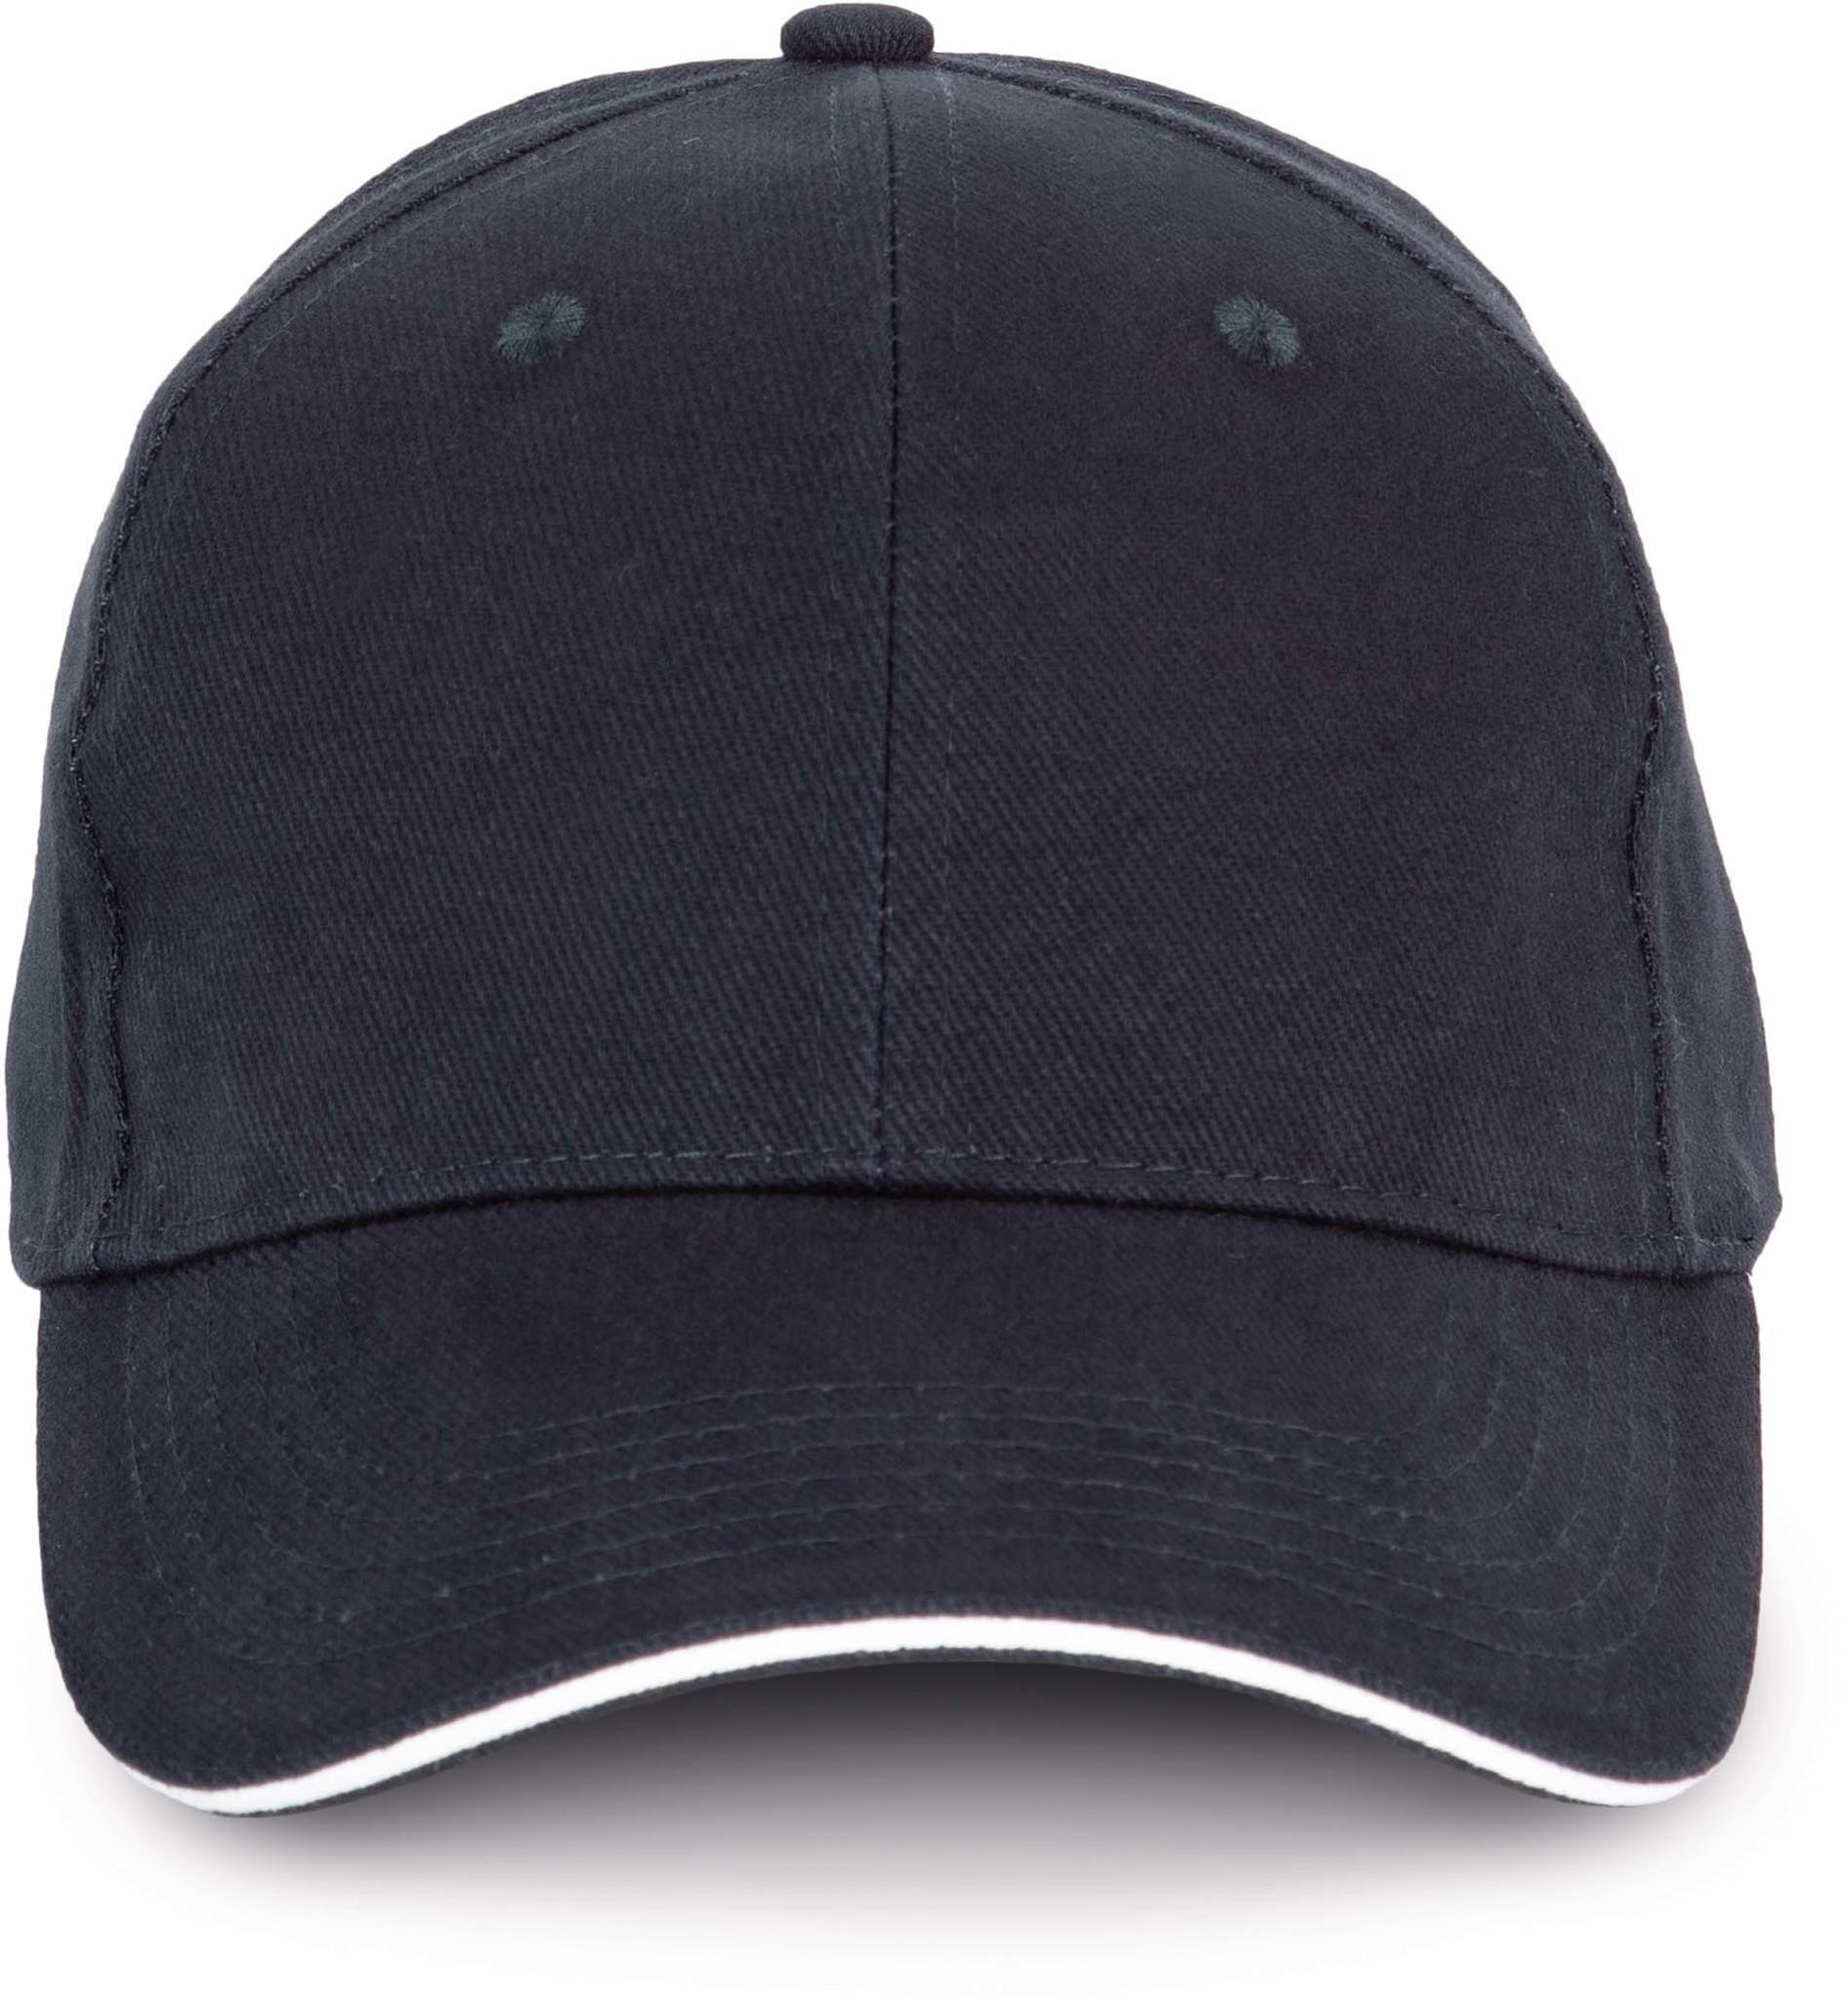 Cap van 100% Biokatoen kleur Navyblue-White